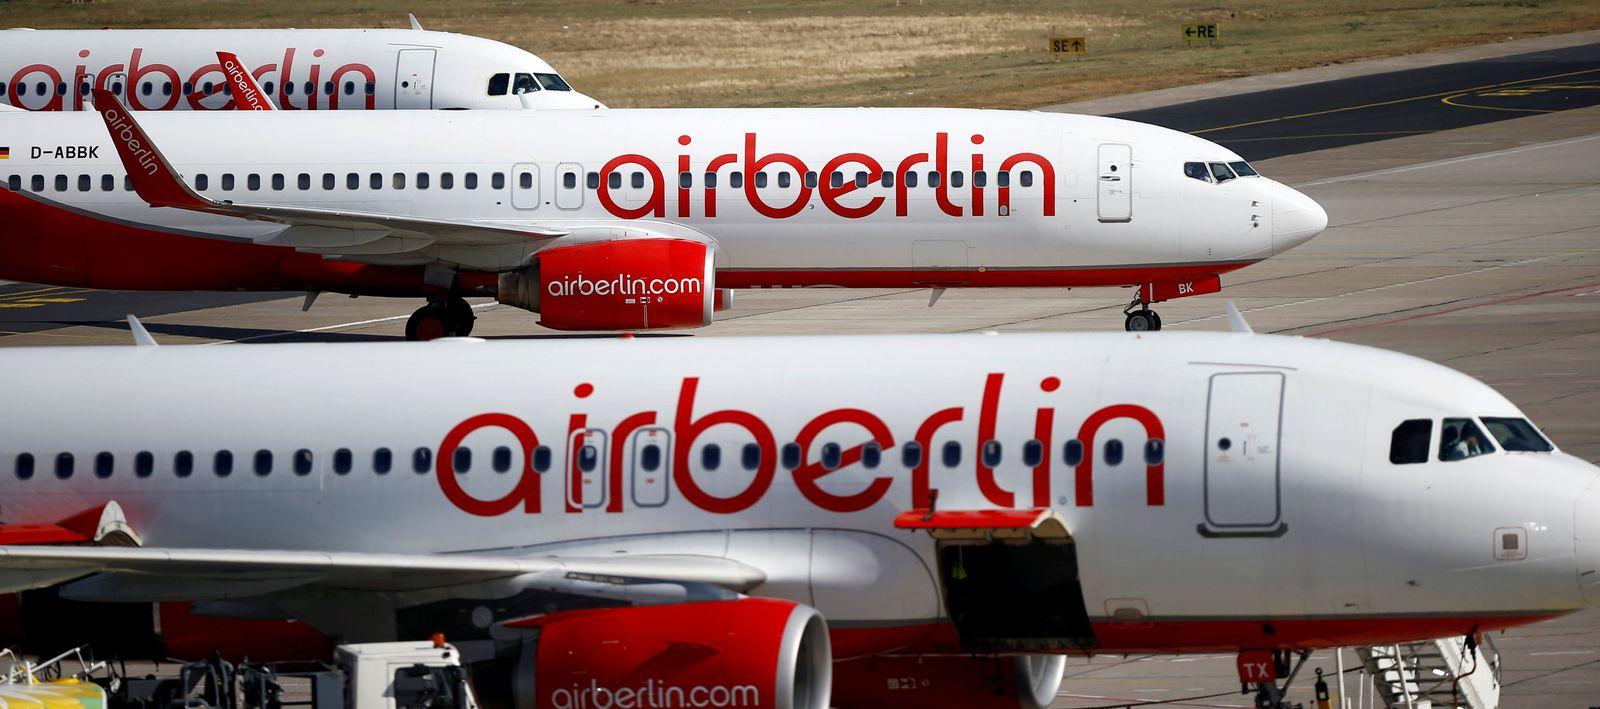 AIR BERLIN / airberlin